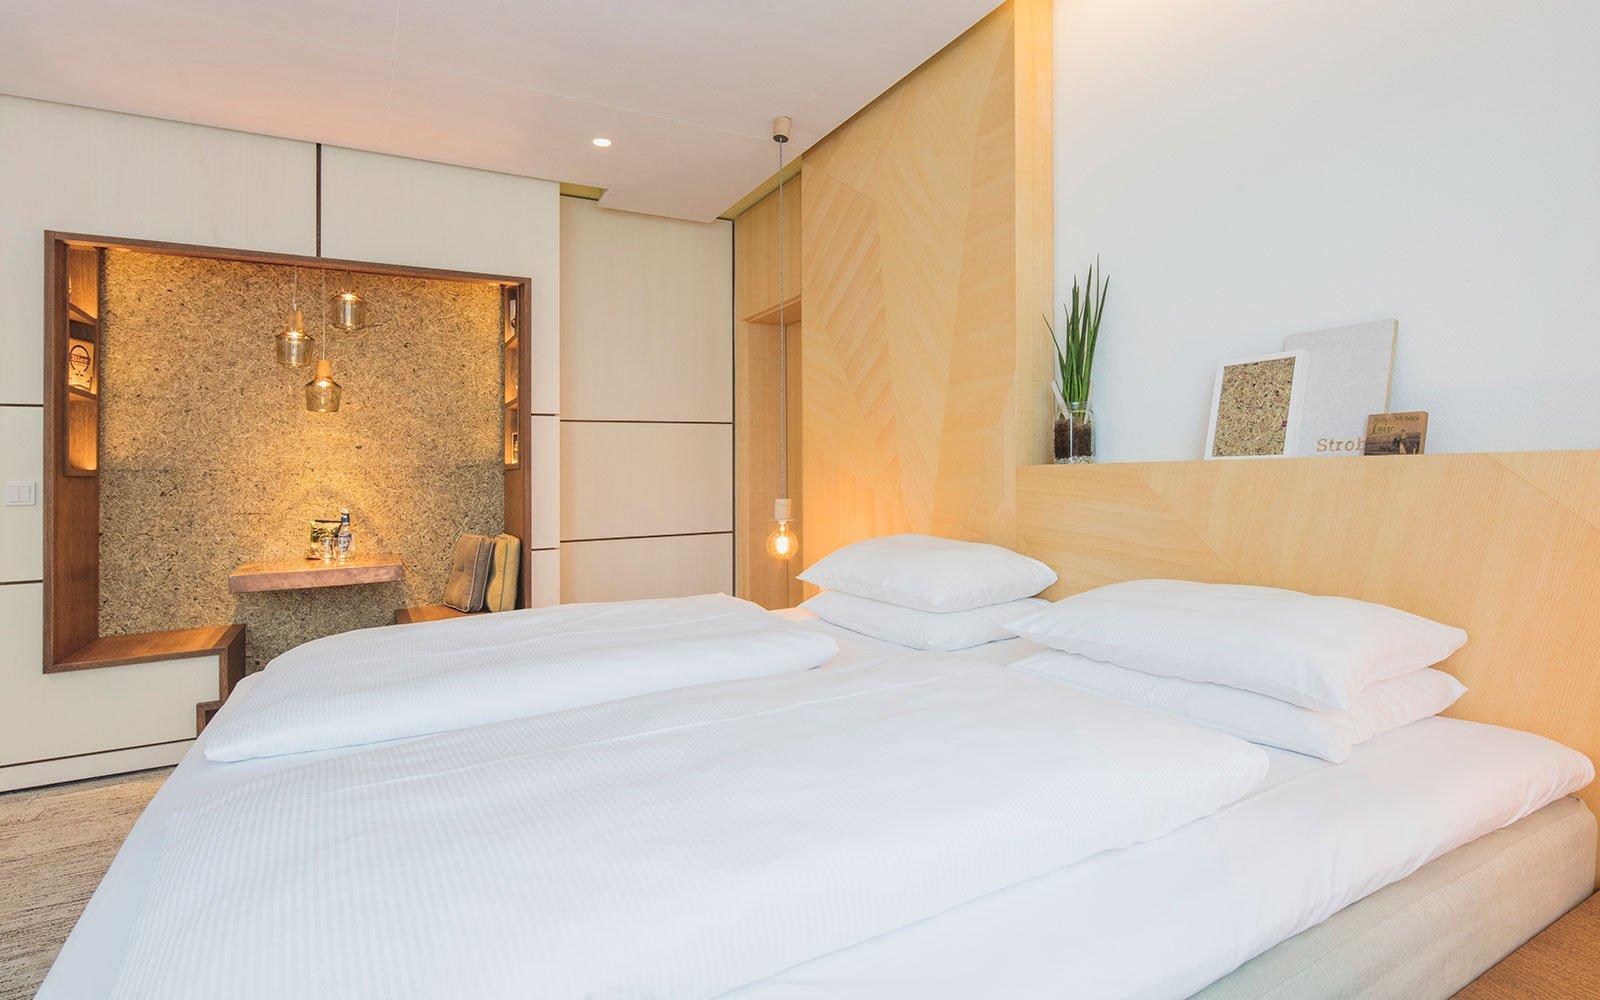 pom_trends_creativ_hotel_luise_01